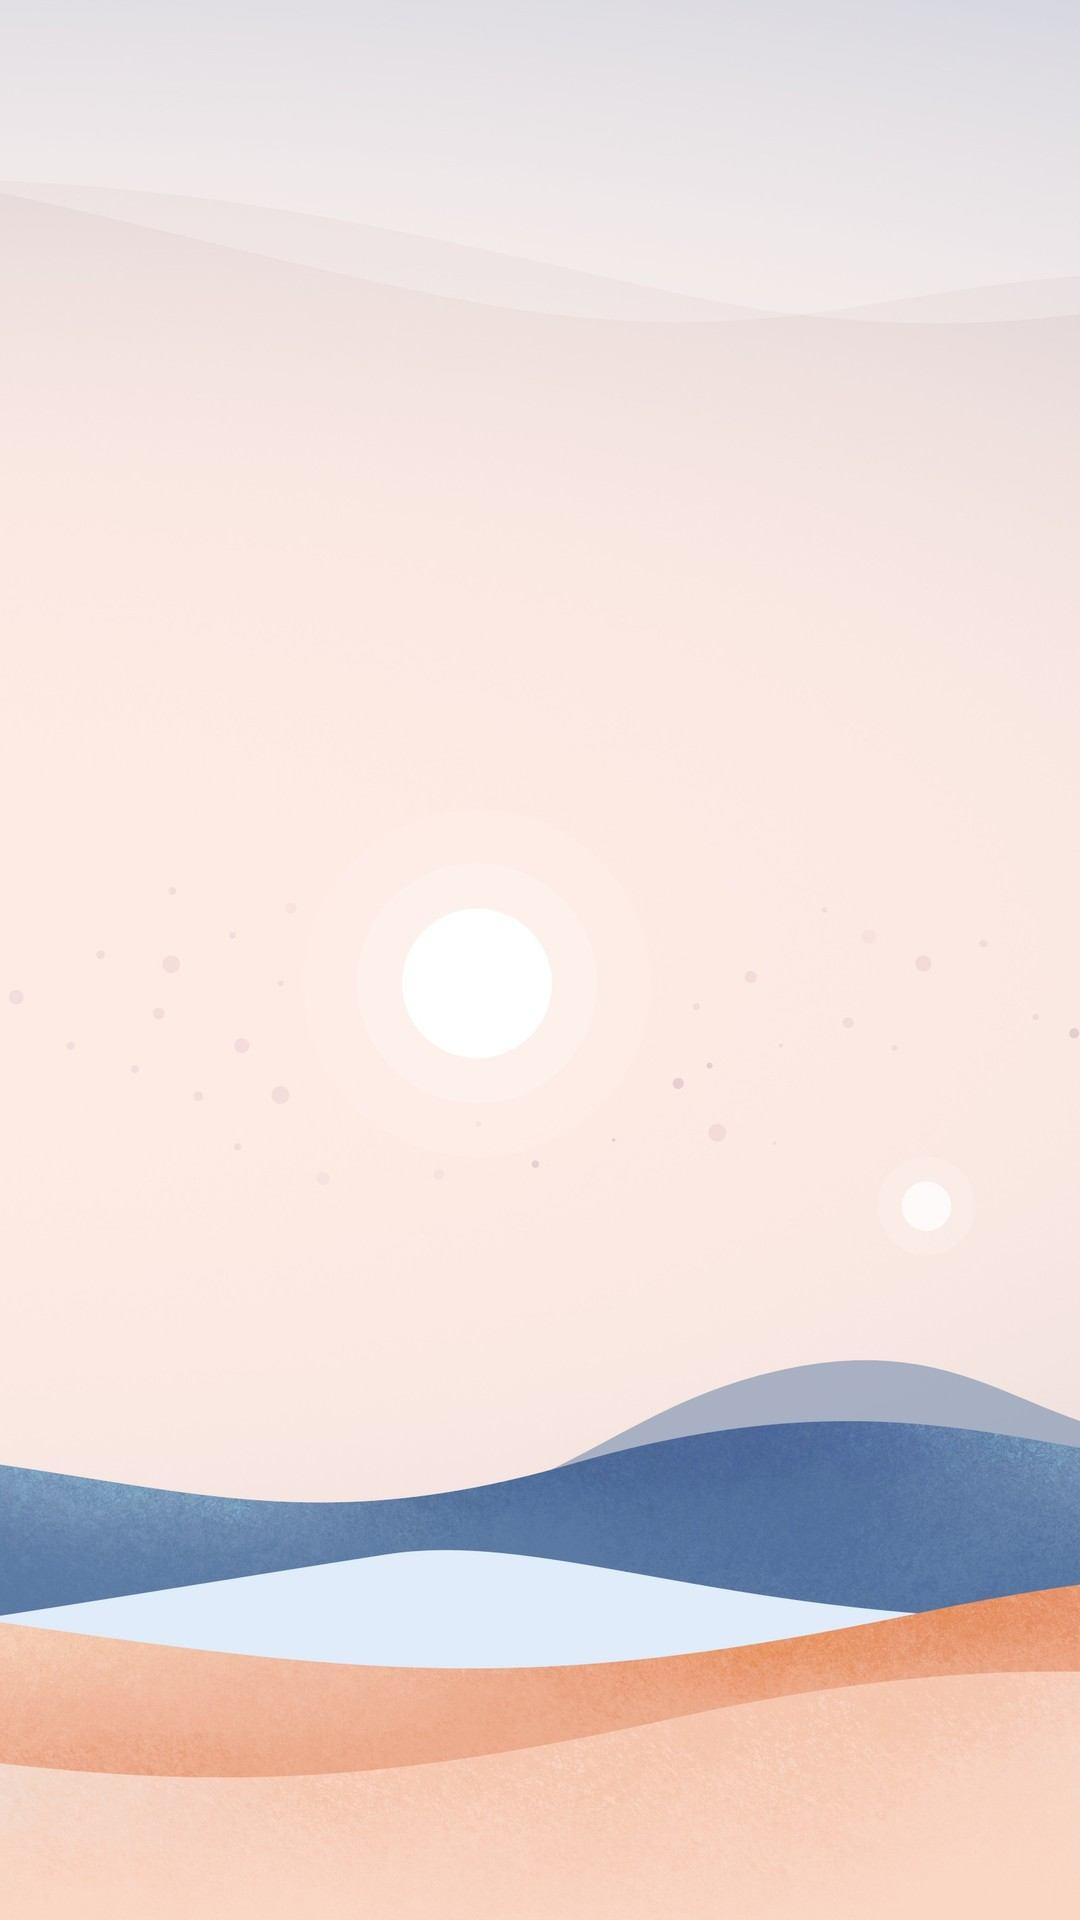 dunes dusk minimal 5k gp 1080x1920 - Pack de Fondos de Pantalla Minimalistas (+100 Imagenes)